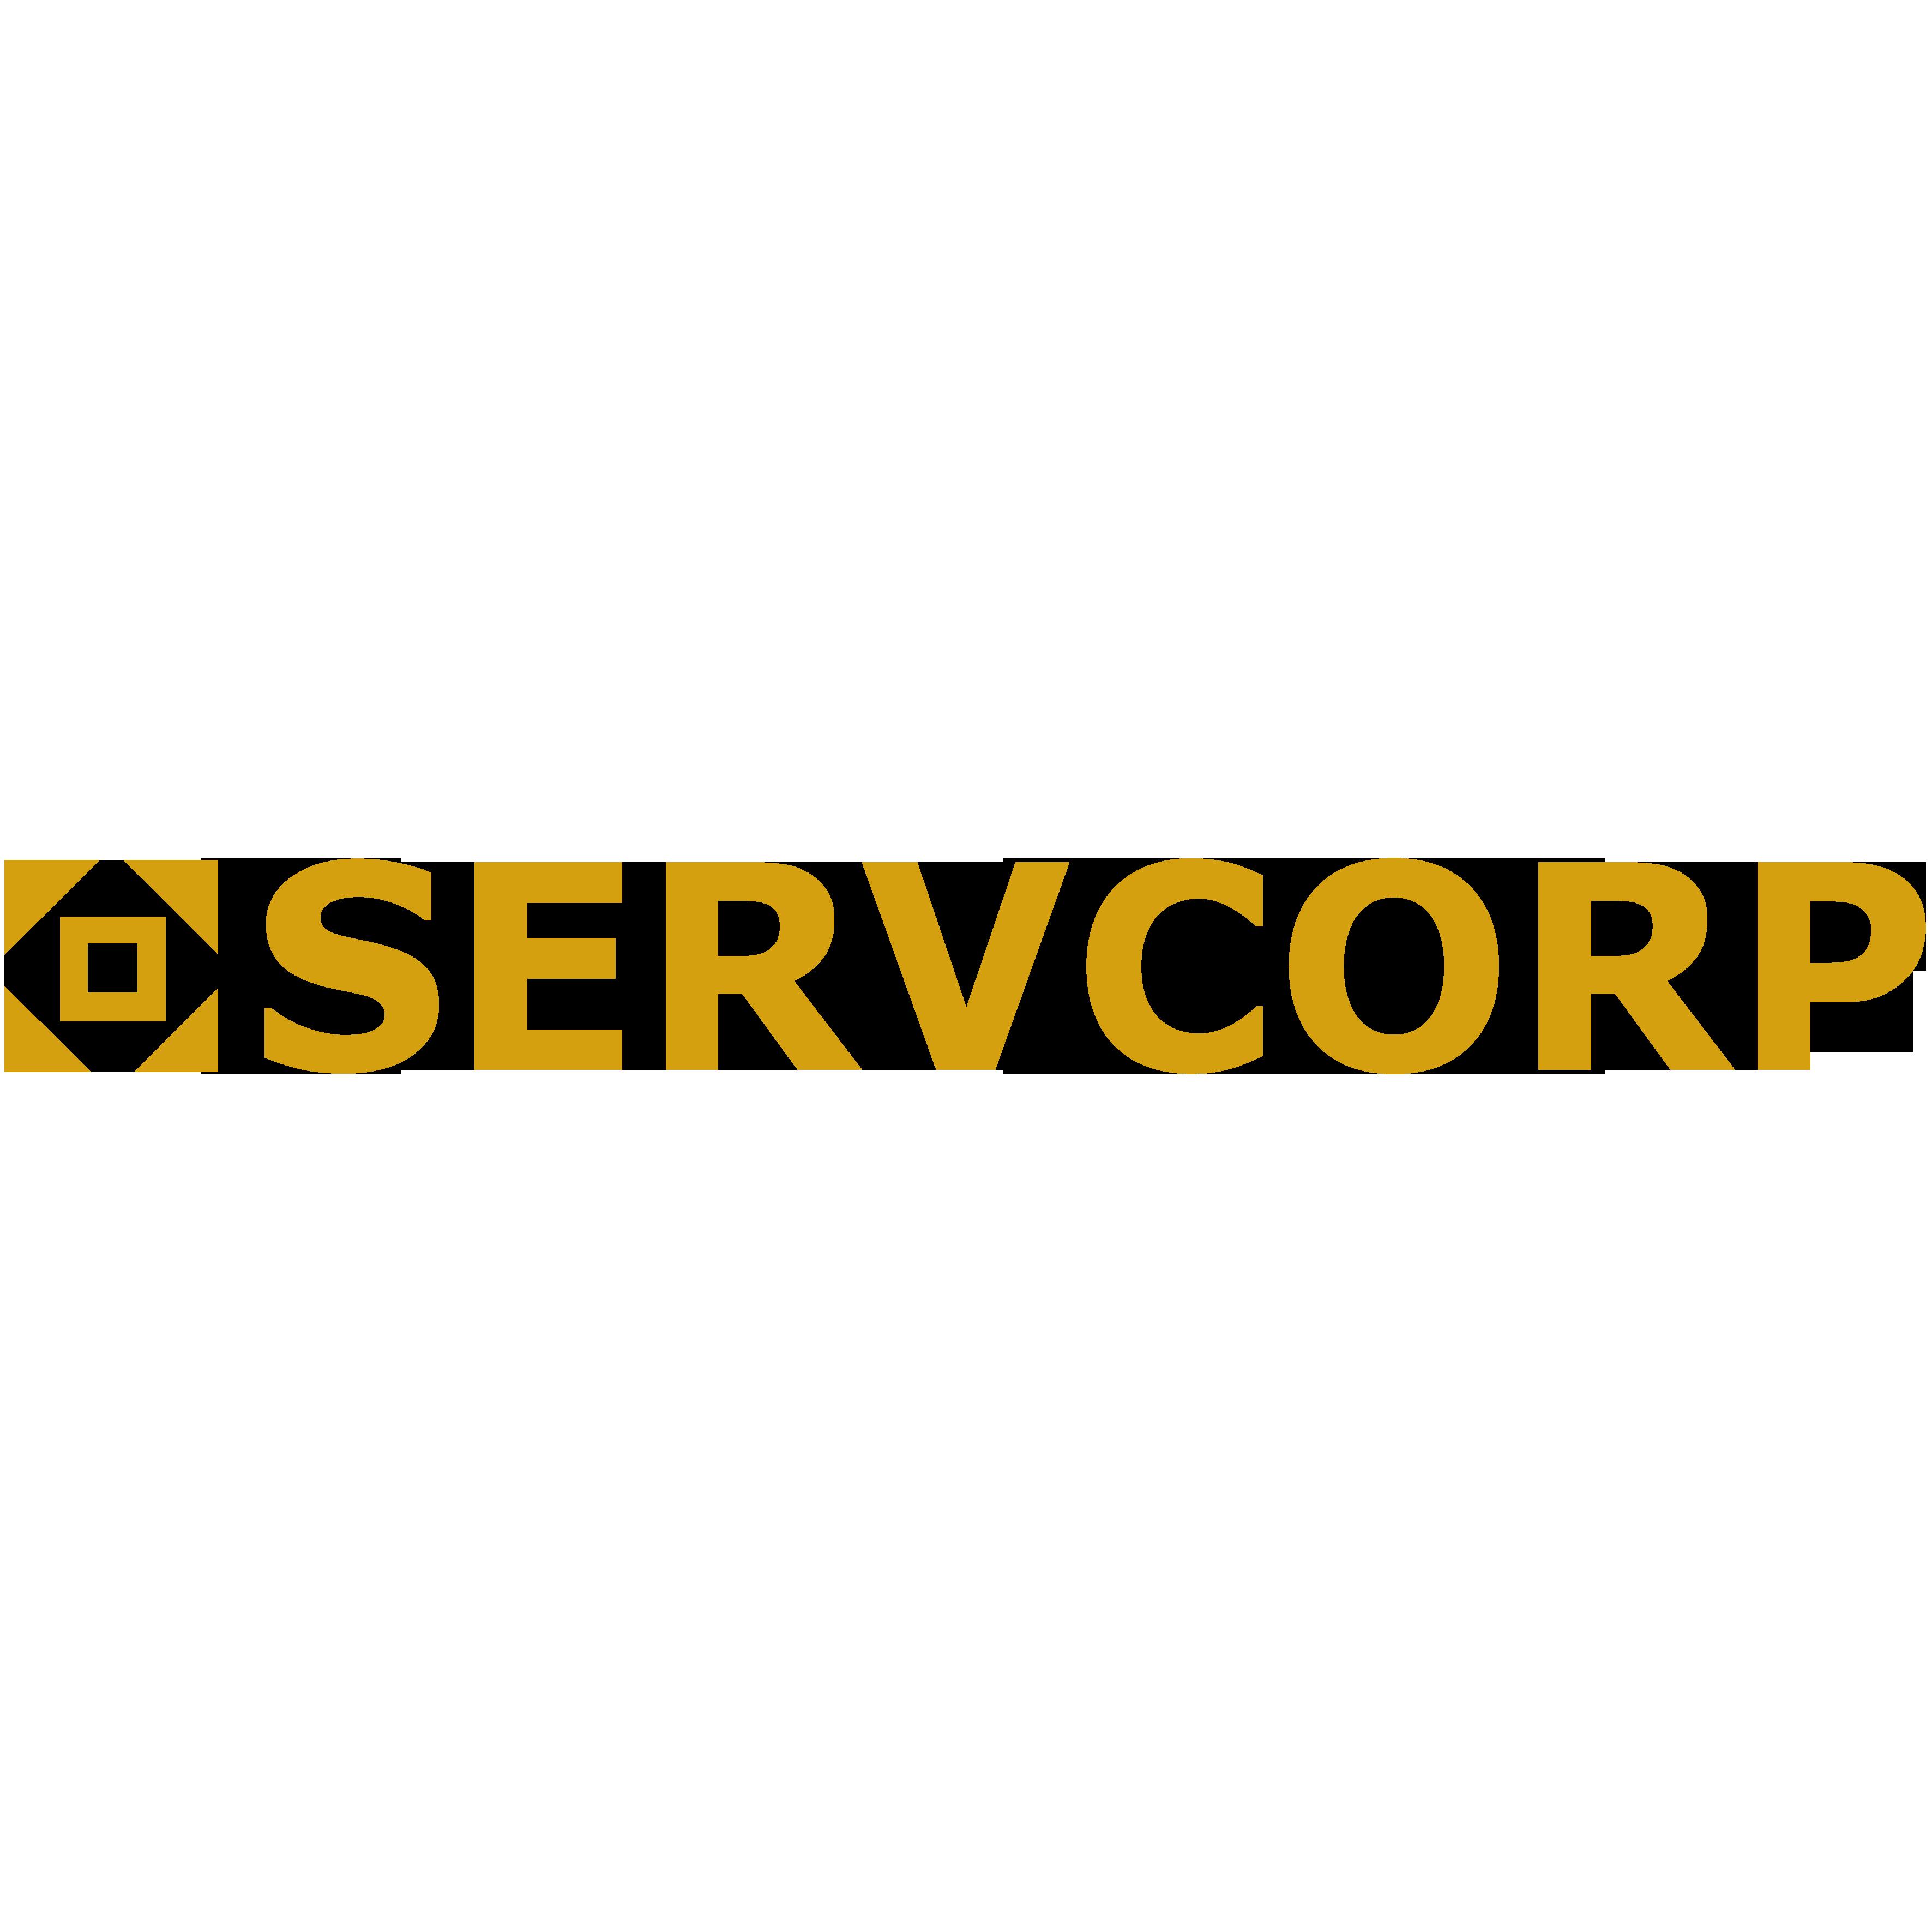 Servcorp Limited logo